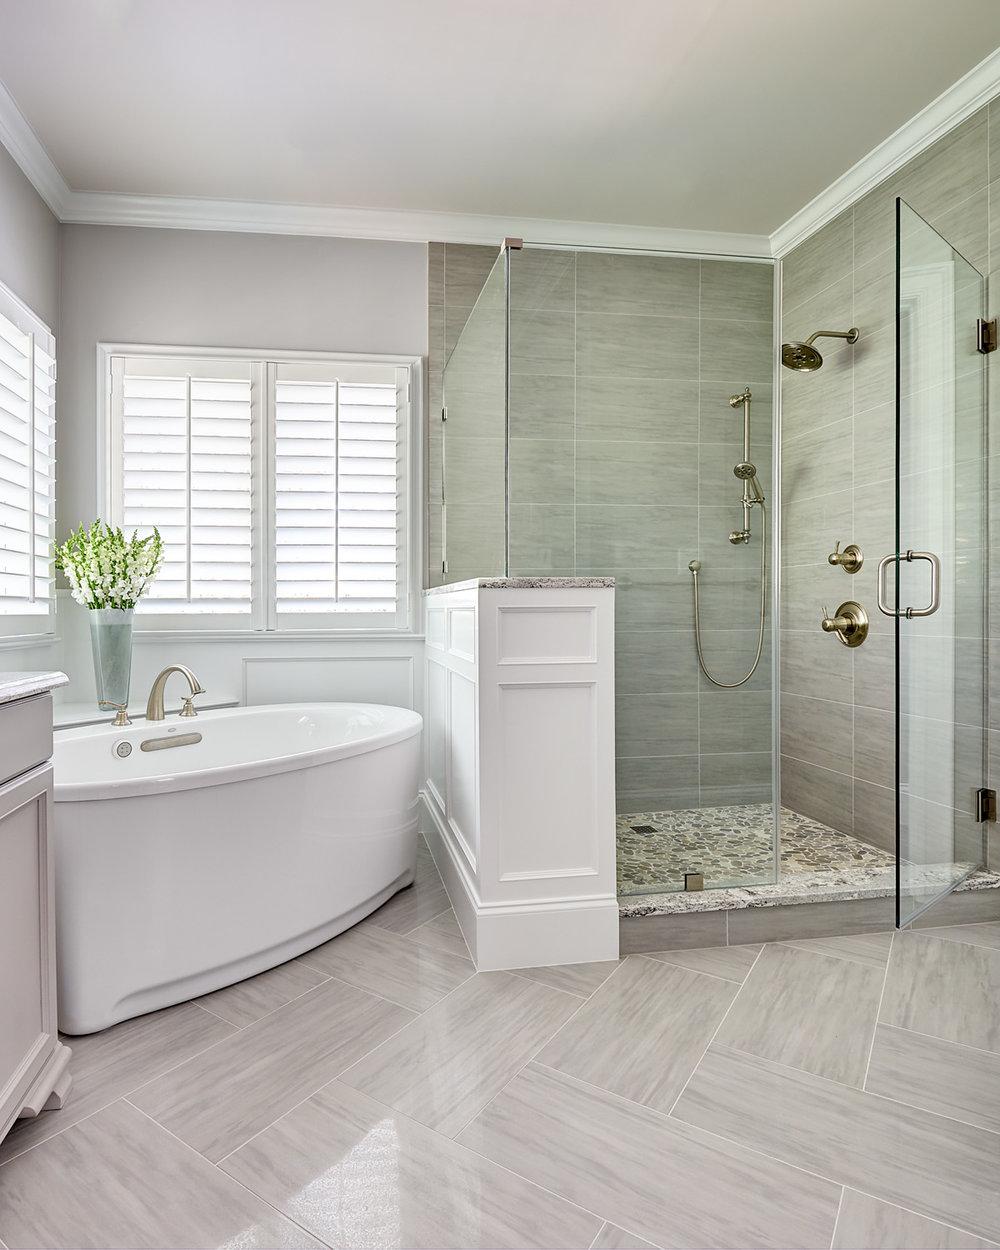 interior-design-modern-Master-Bathroom-charlotte-nc-2.jpg